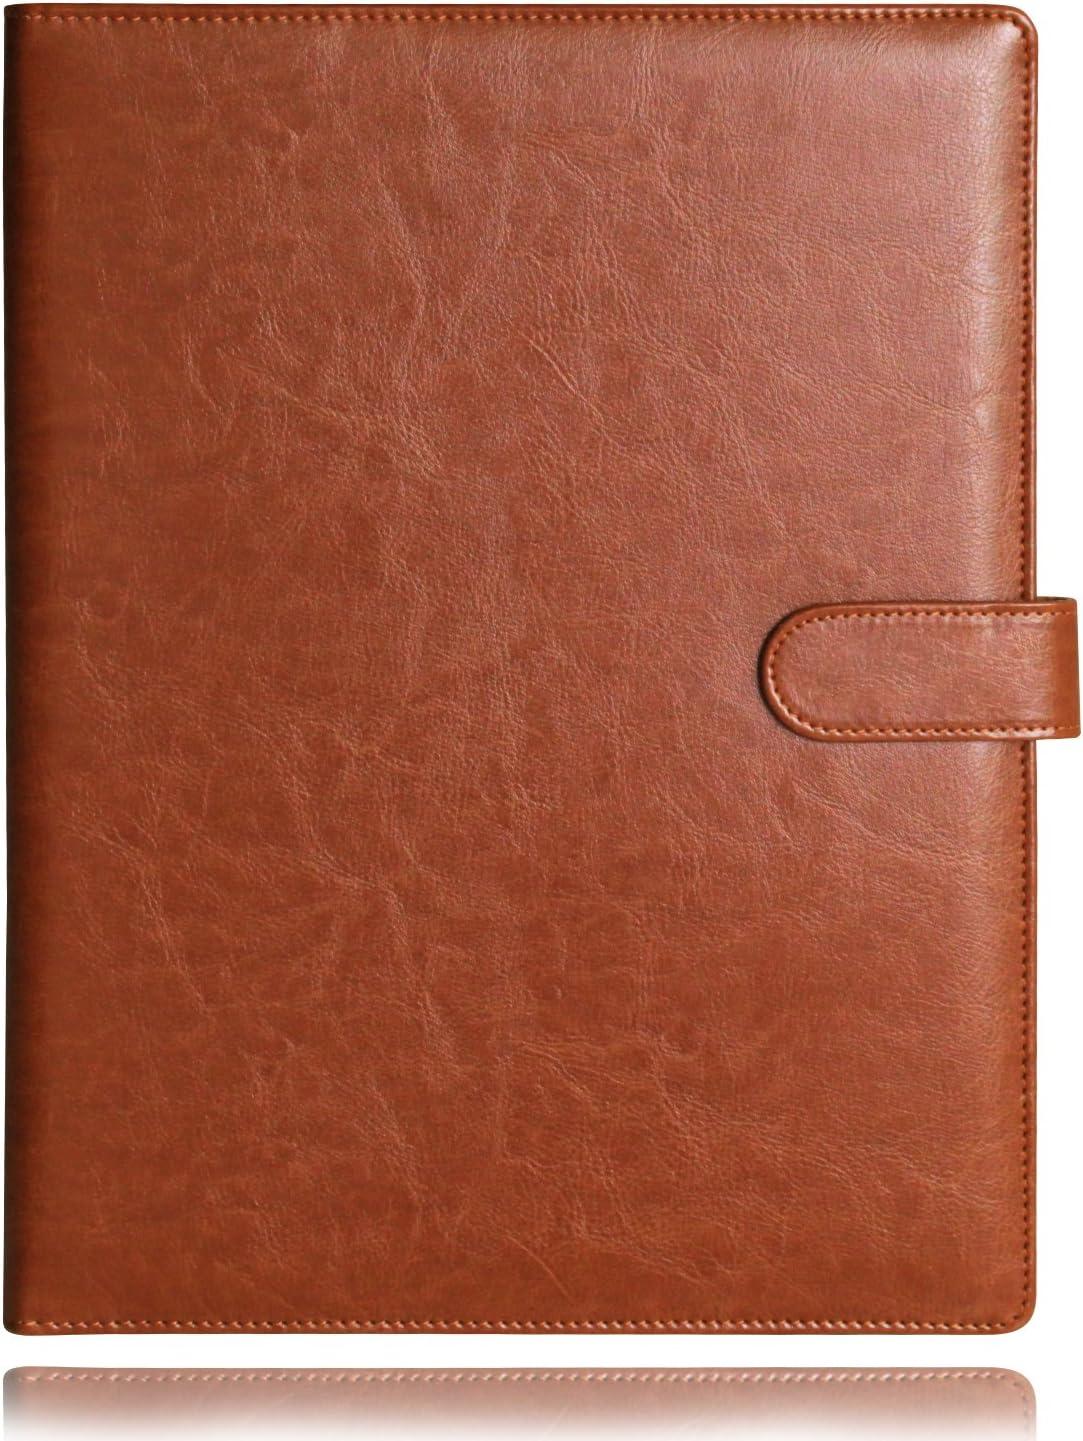 Laconile carpeta A4portapapeles, portadocumentos rellenable, cartera organizadora de piel sintética resistente, color marrón 25X32cm